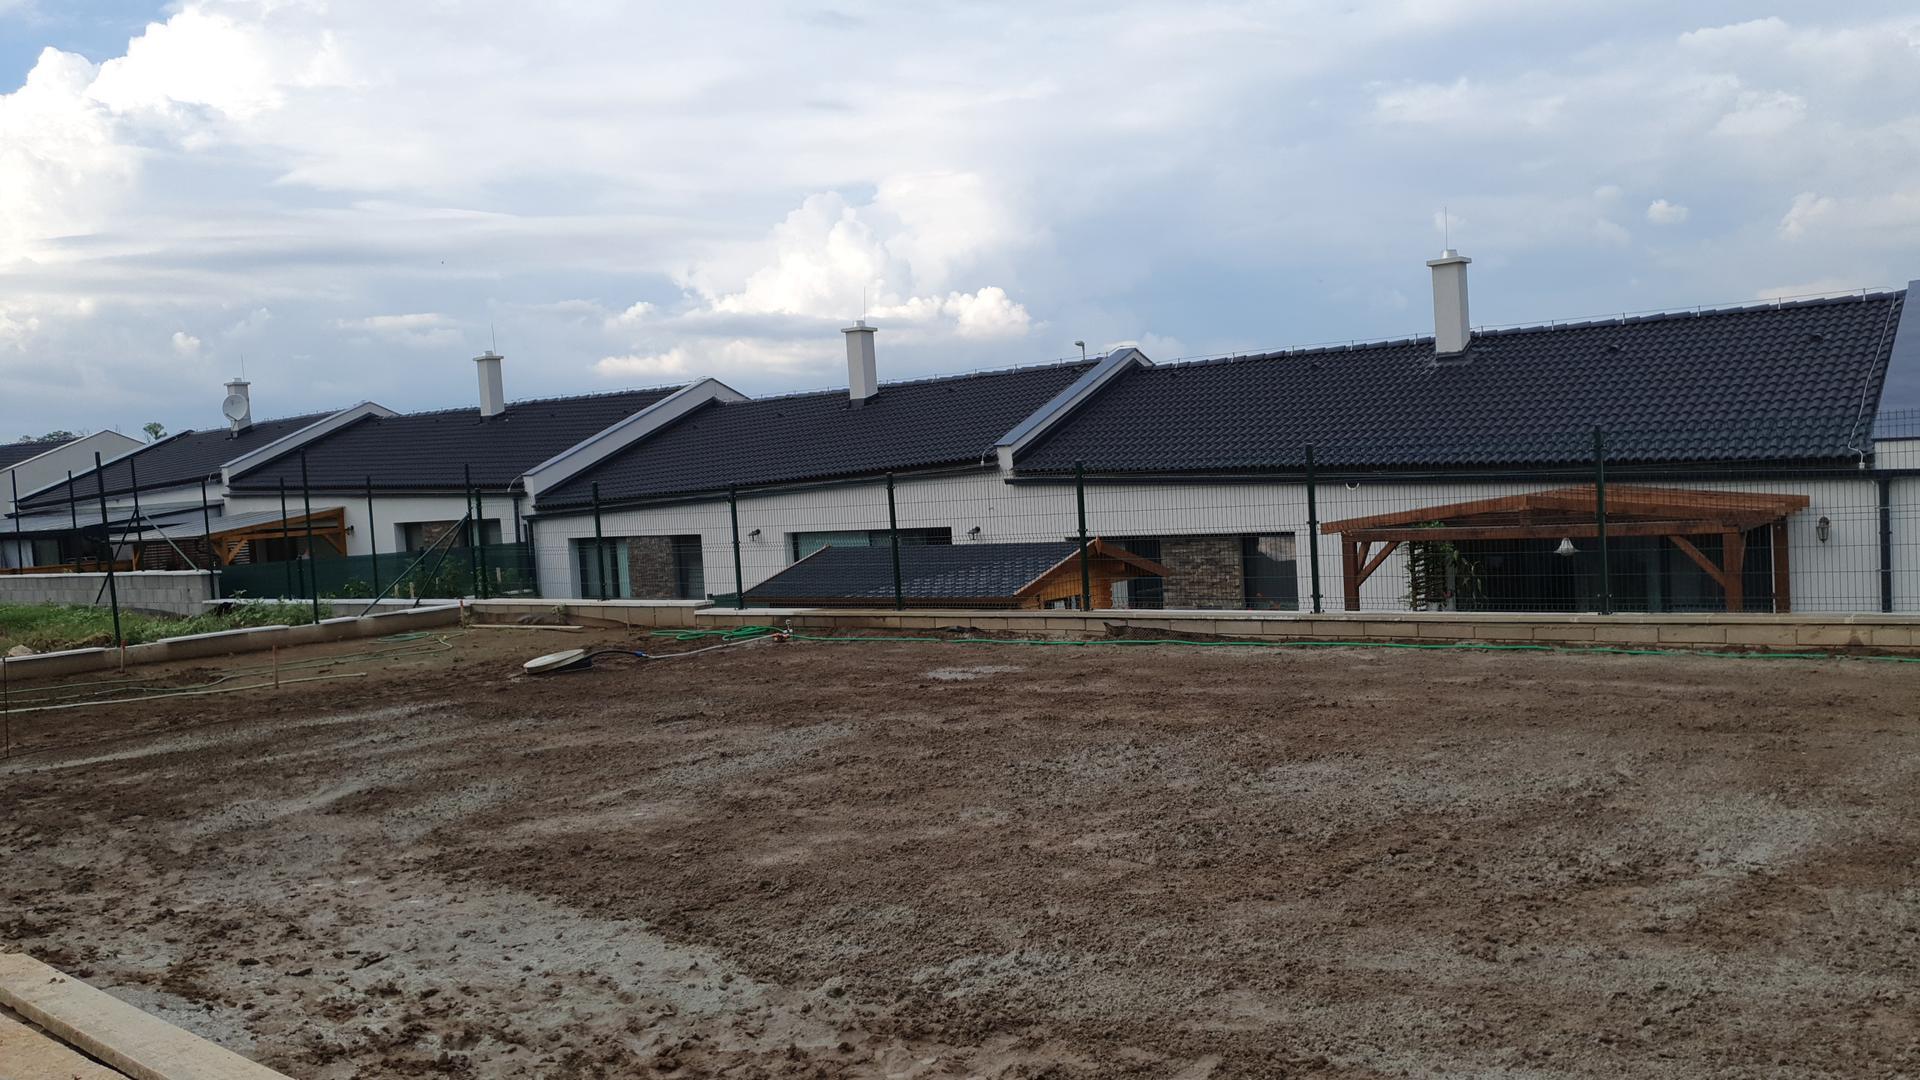 Travnik - Polievat sa bude 8x denne, ked nebude prsat.